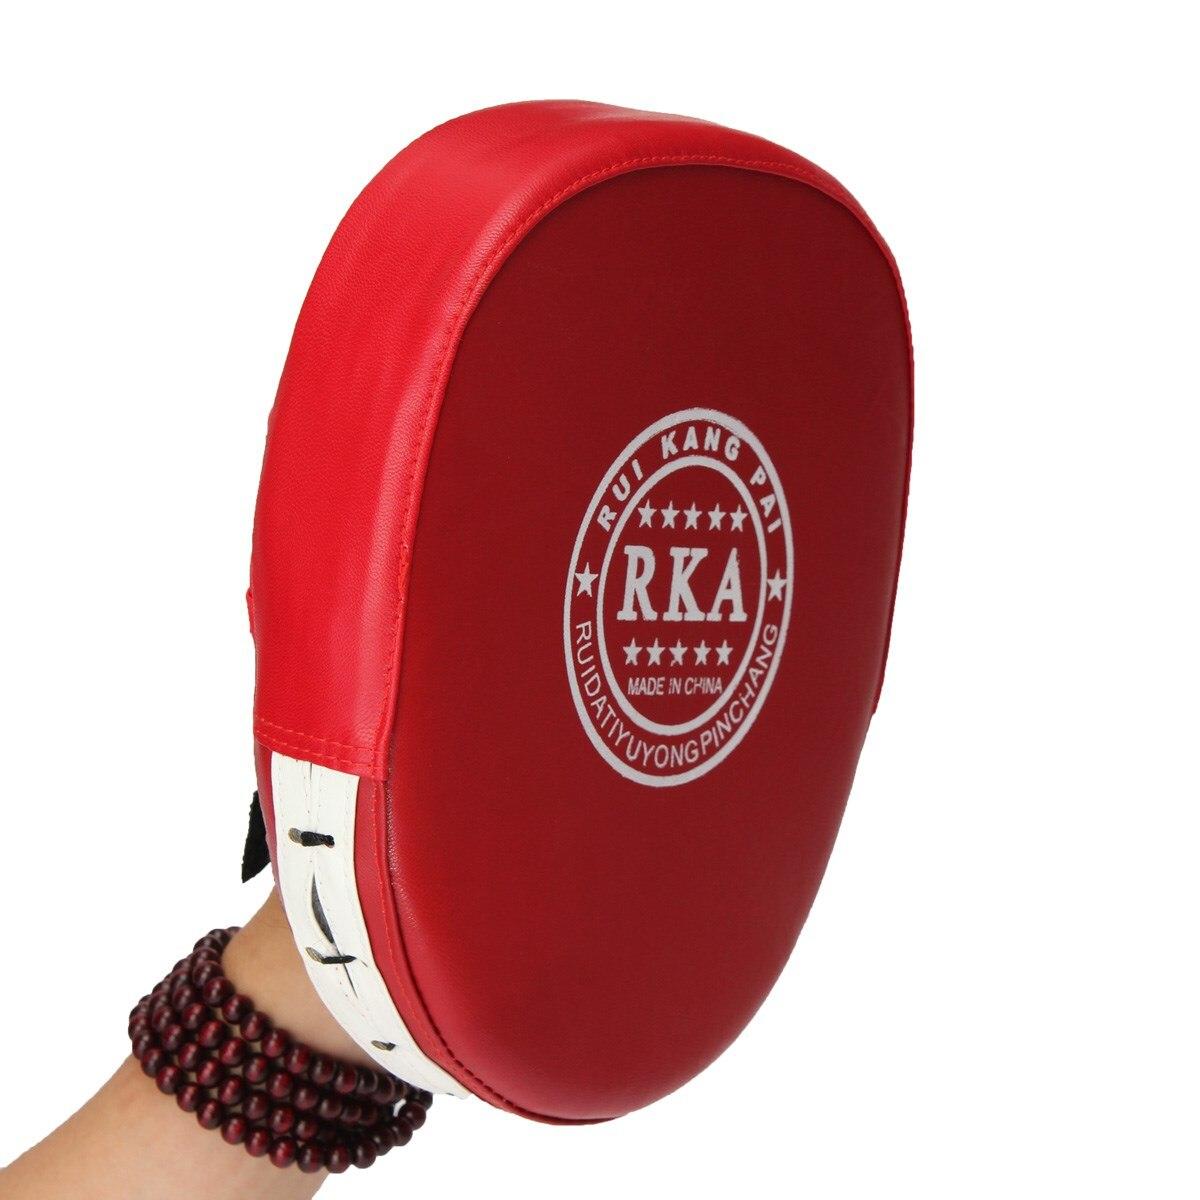 2 stücke Fitness Schlag Boxen Ausbildung Taschen Pad Fokussierung Ziel Pad Handschuh MMA Karate Muay Thai Kick Sanda Pads Sport handschuhe